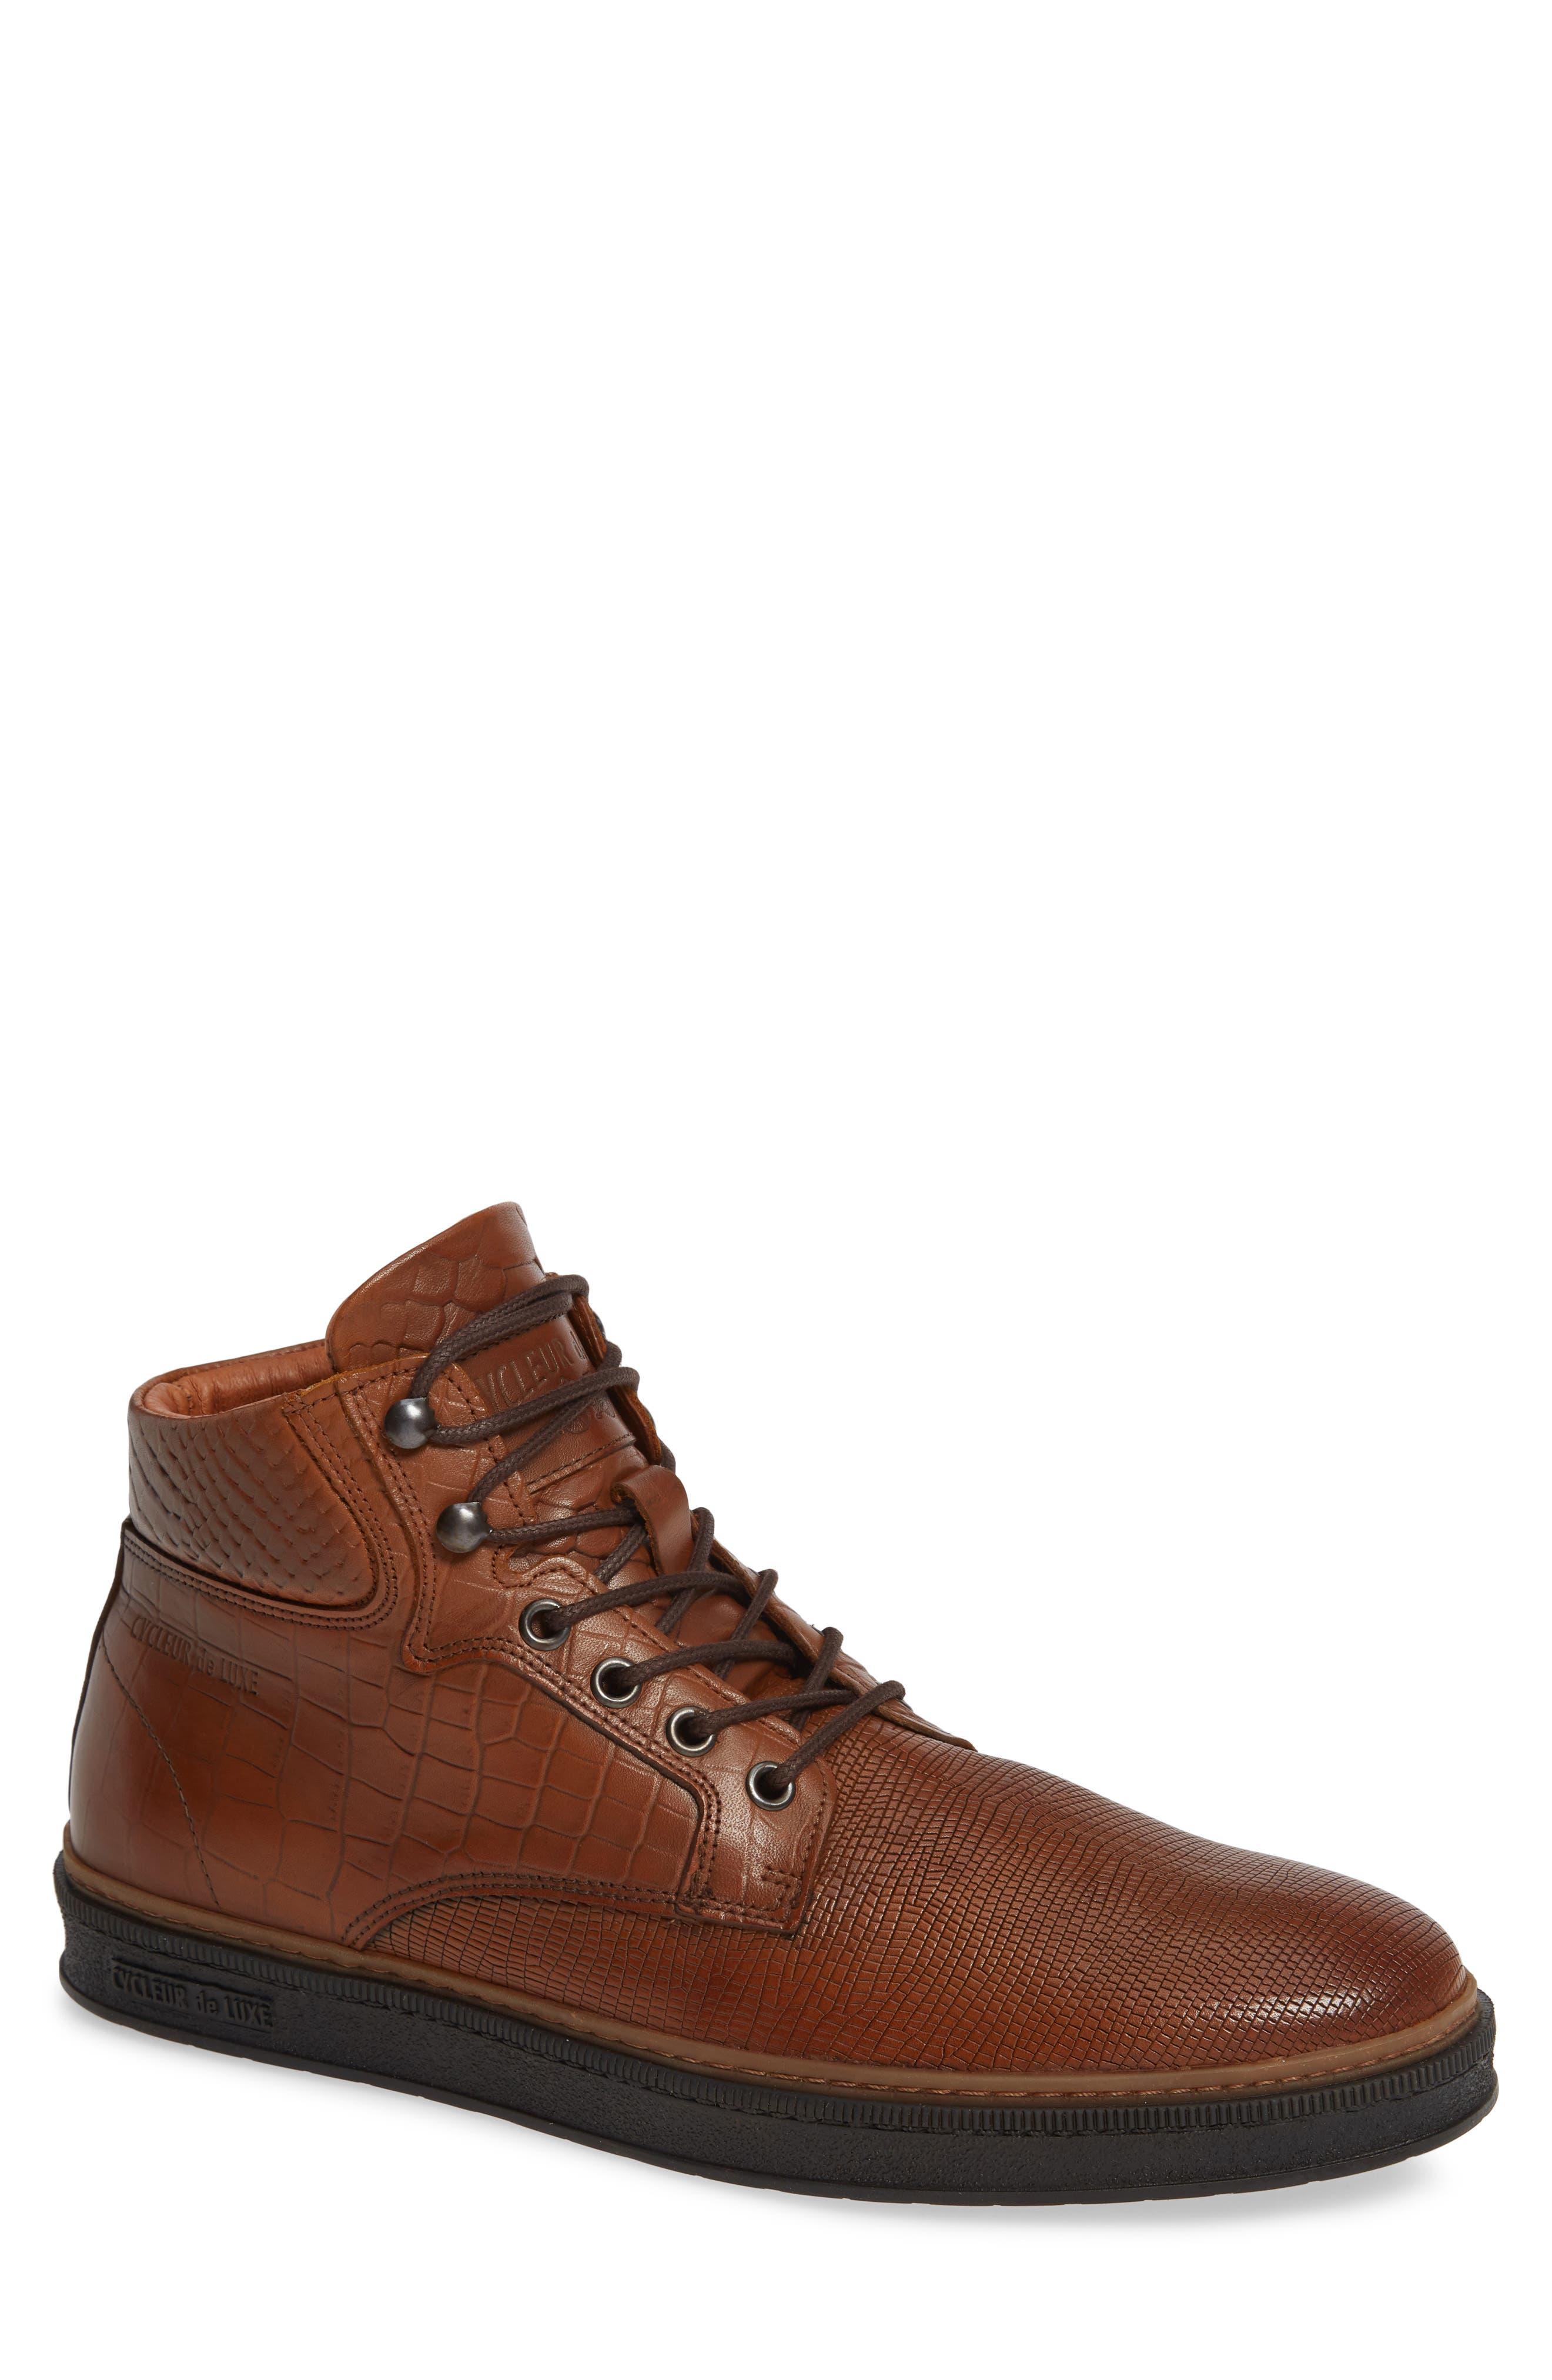 Lissabon Sneaker,                             Main thumbnail 1, color,                             DARK COGNAC